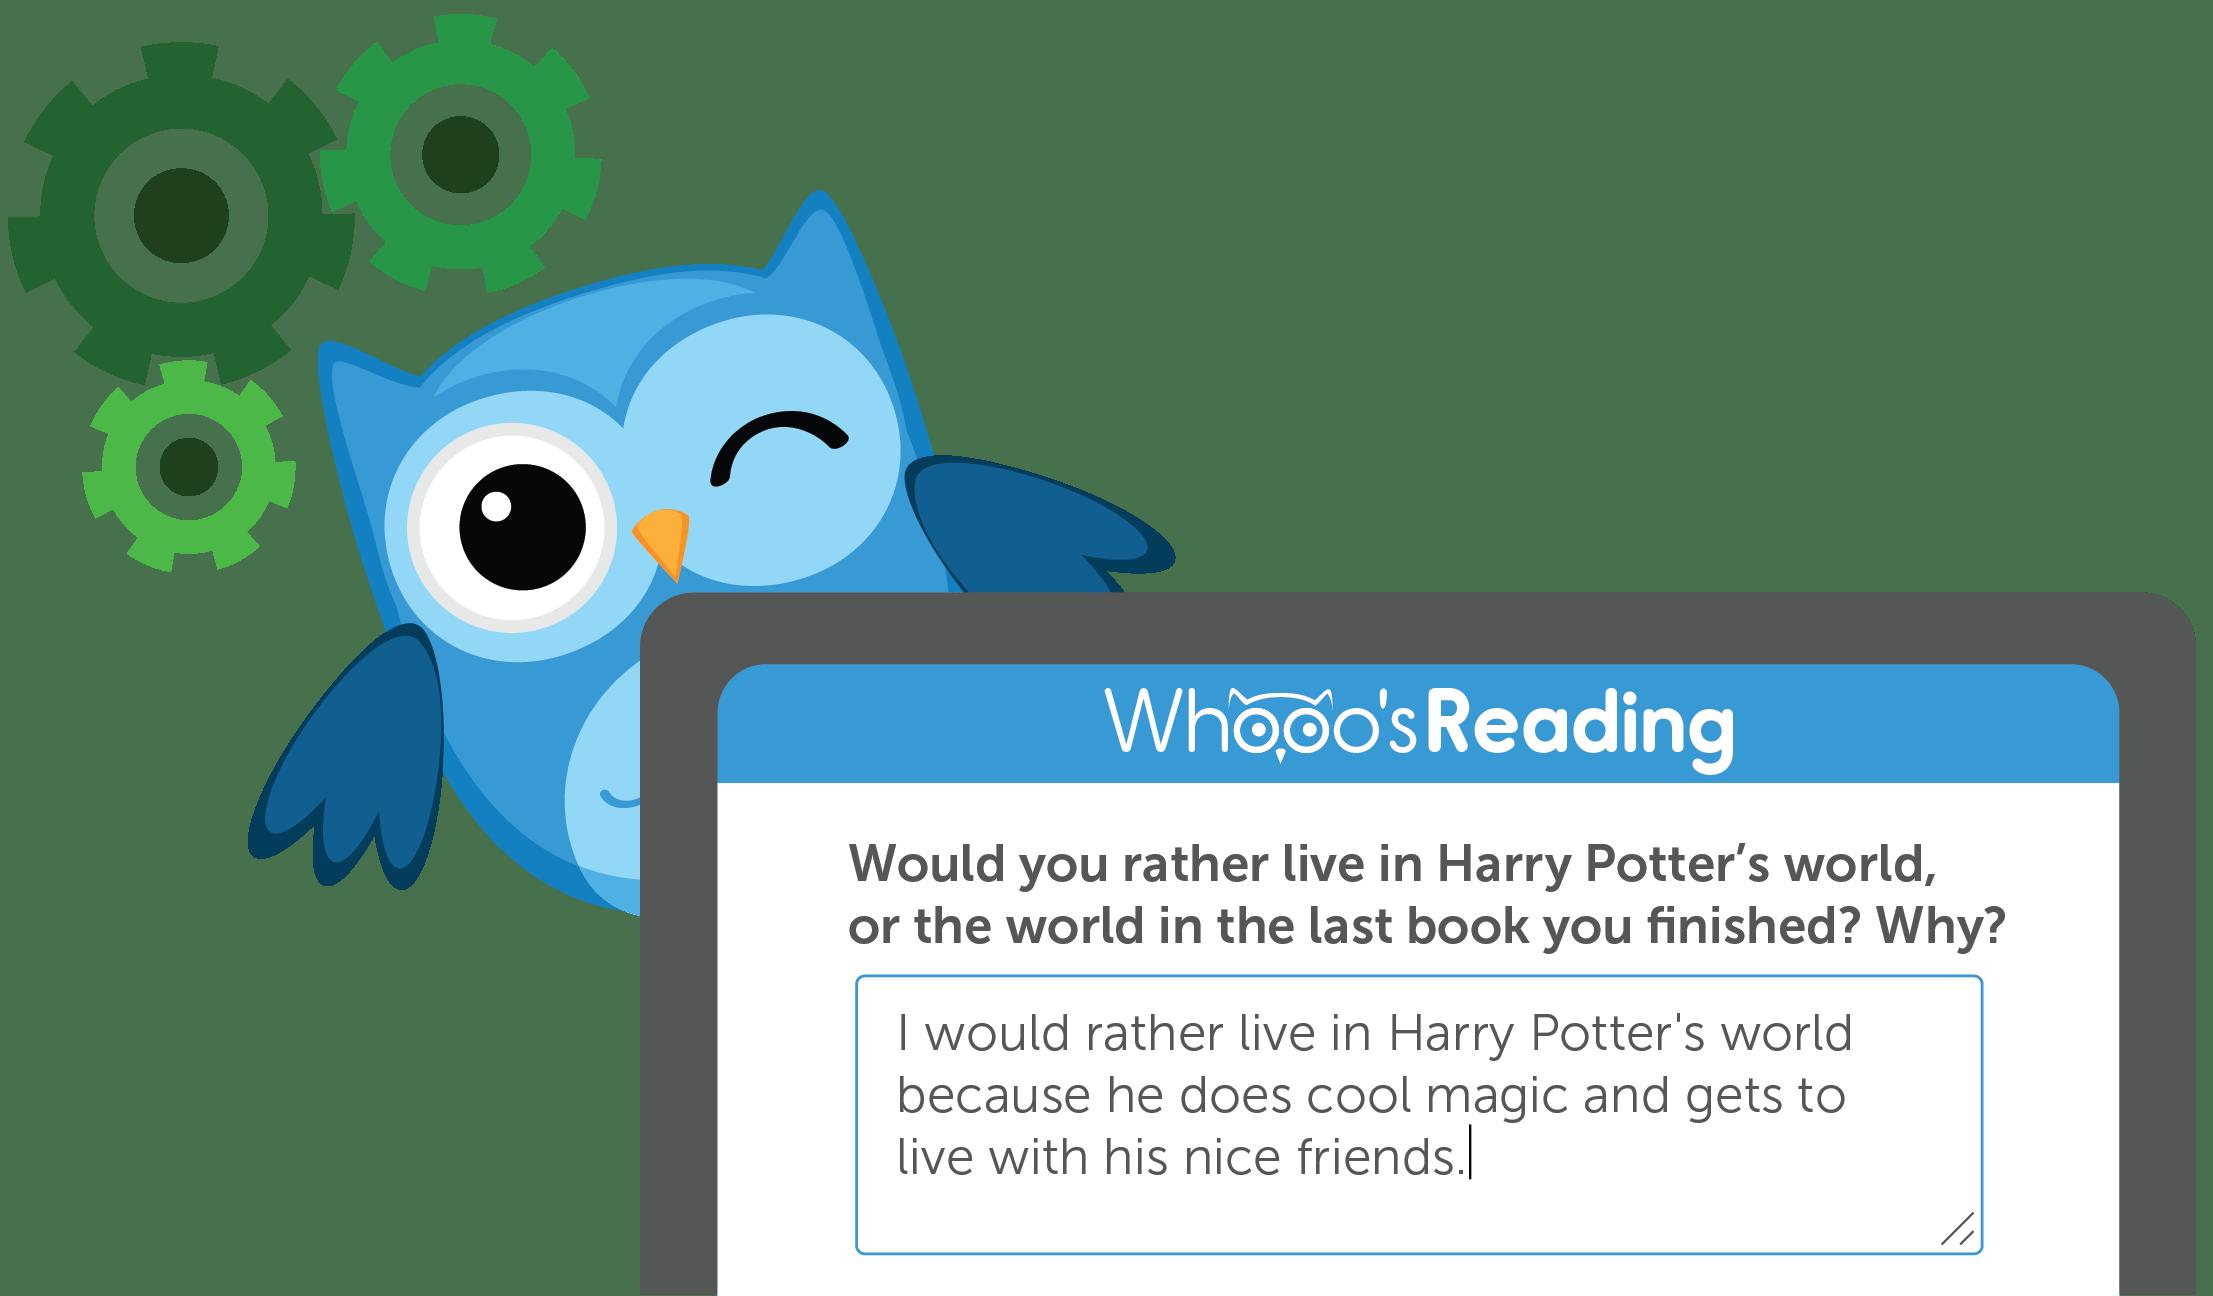 Whooo S Reading